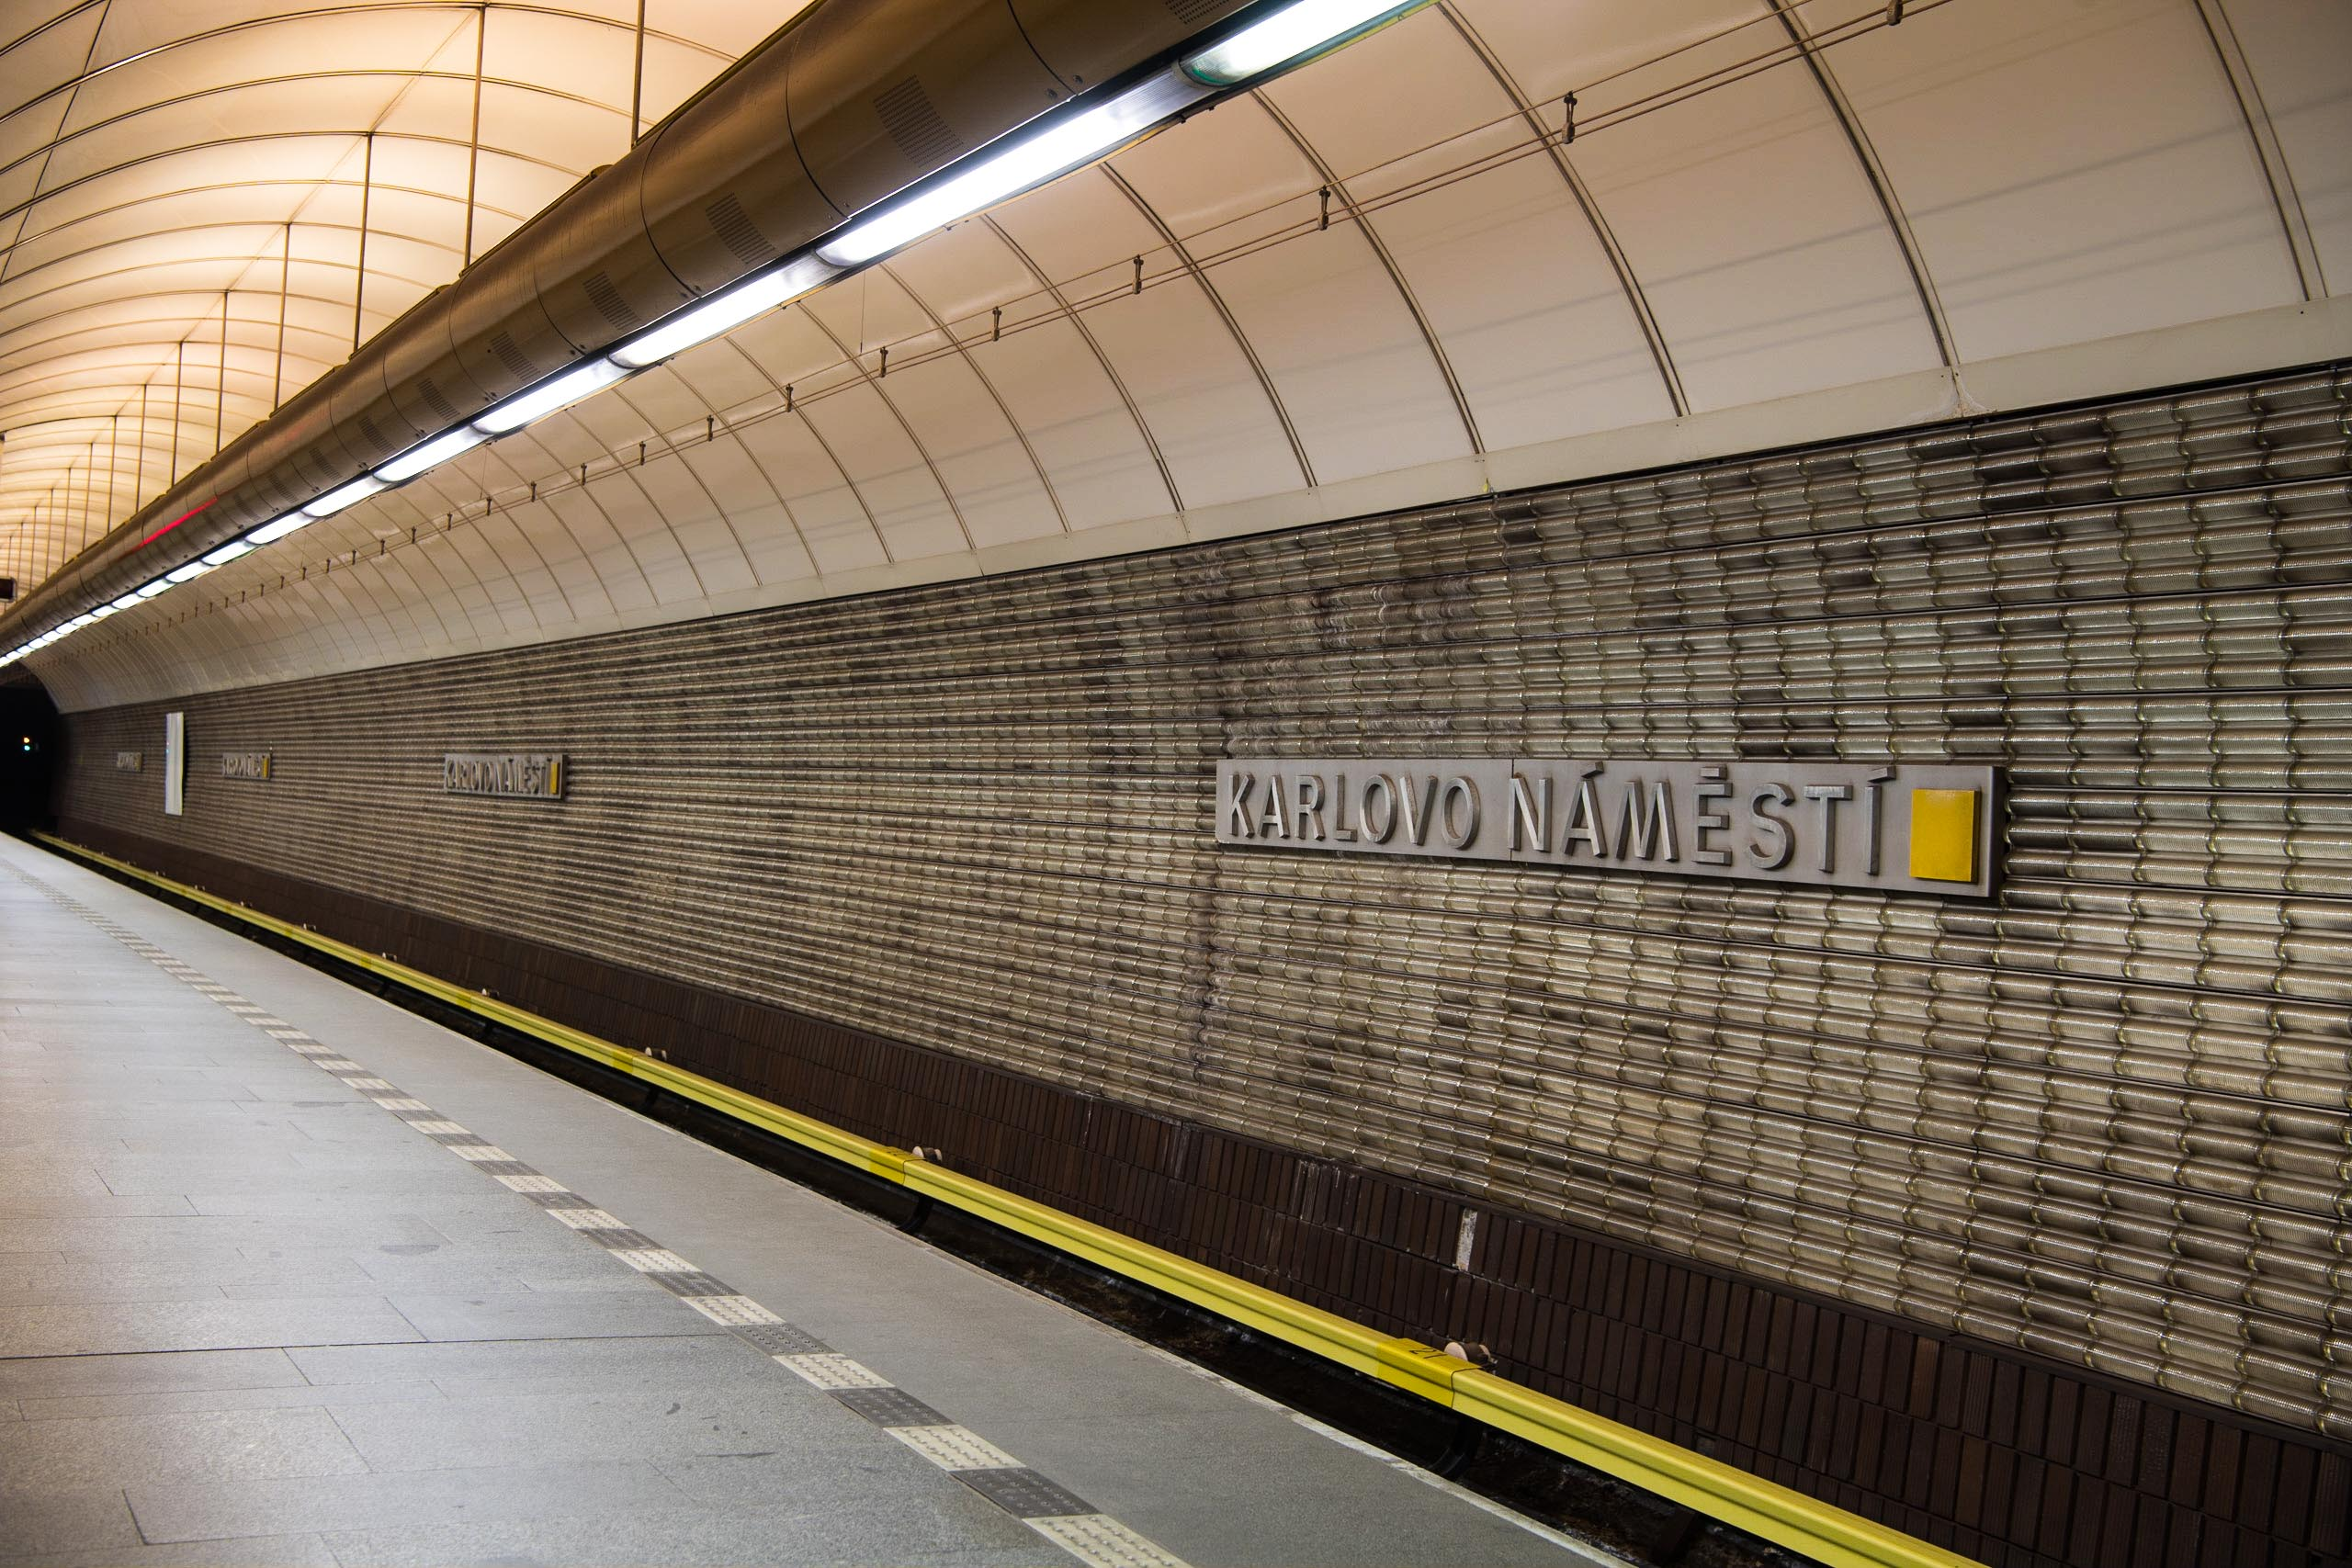 Bahnhöfe-9